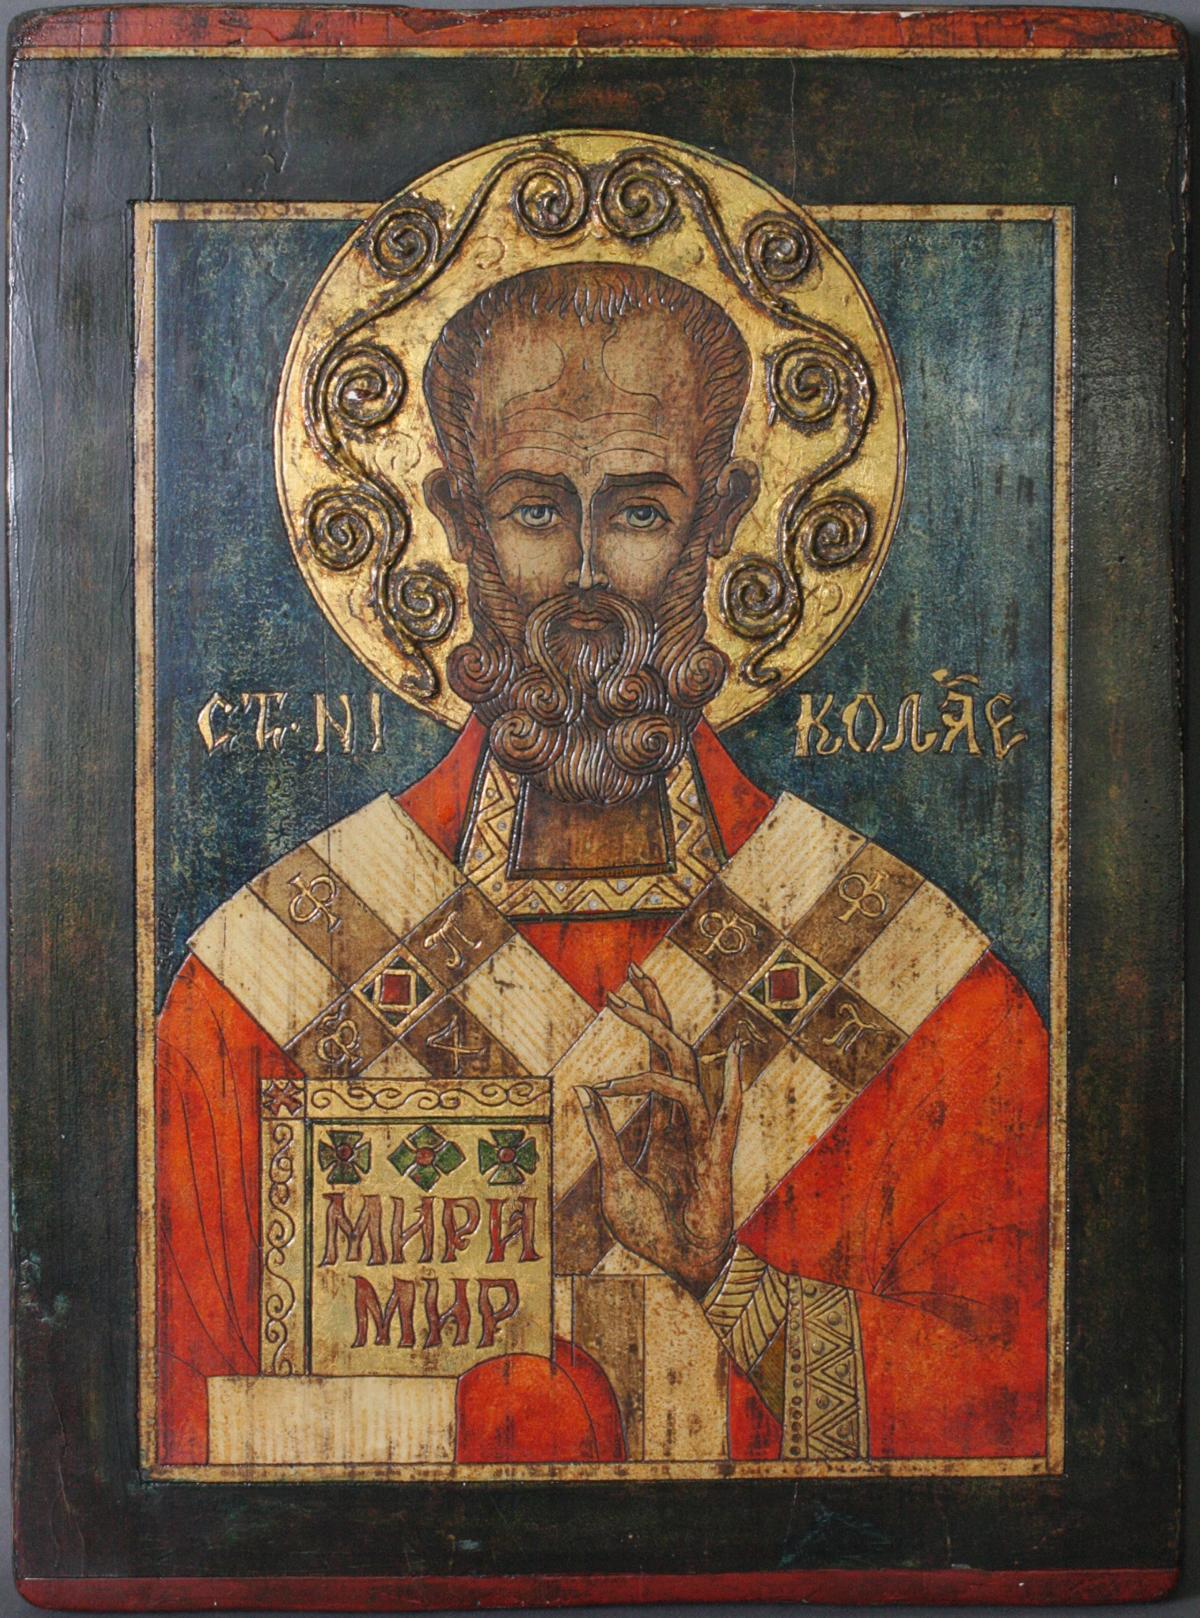 Ikone Heiliger Nikolaus, Replik 2. Hälfte 20. Jahrhundert